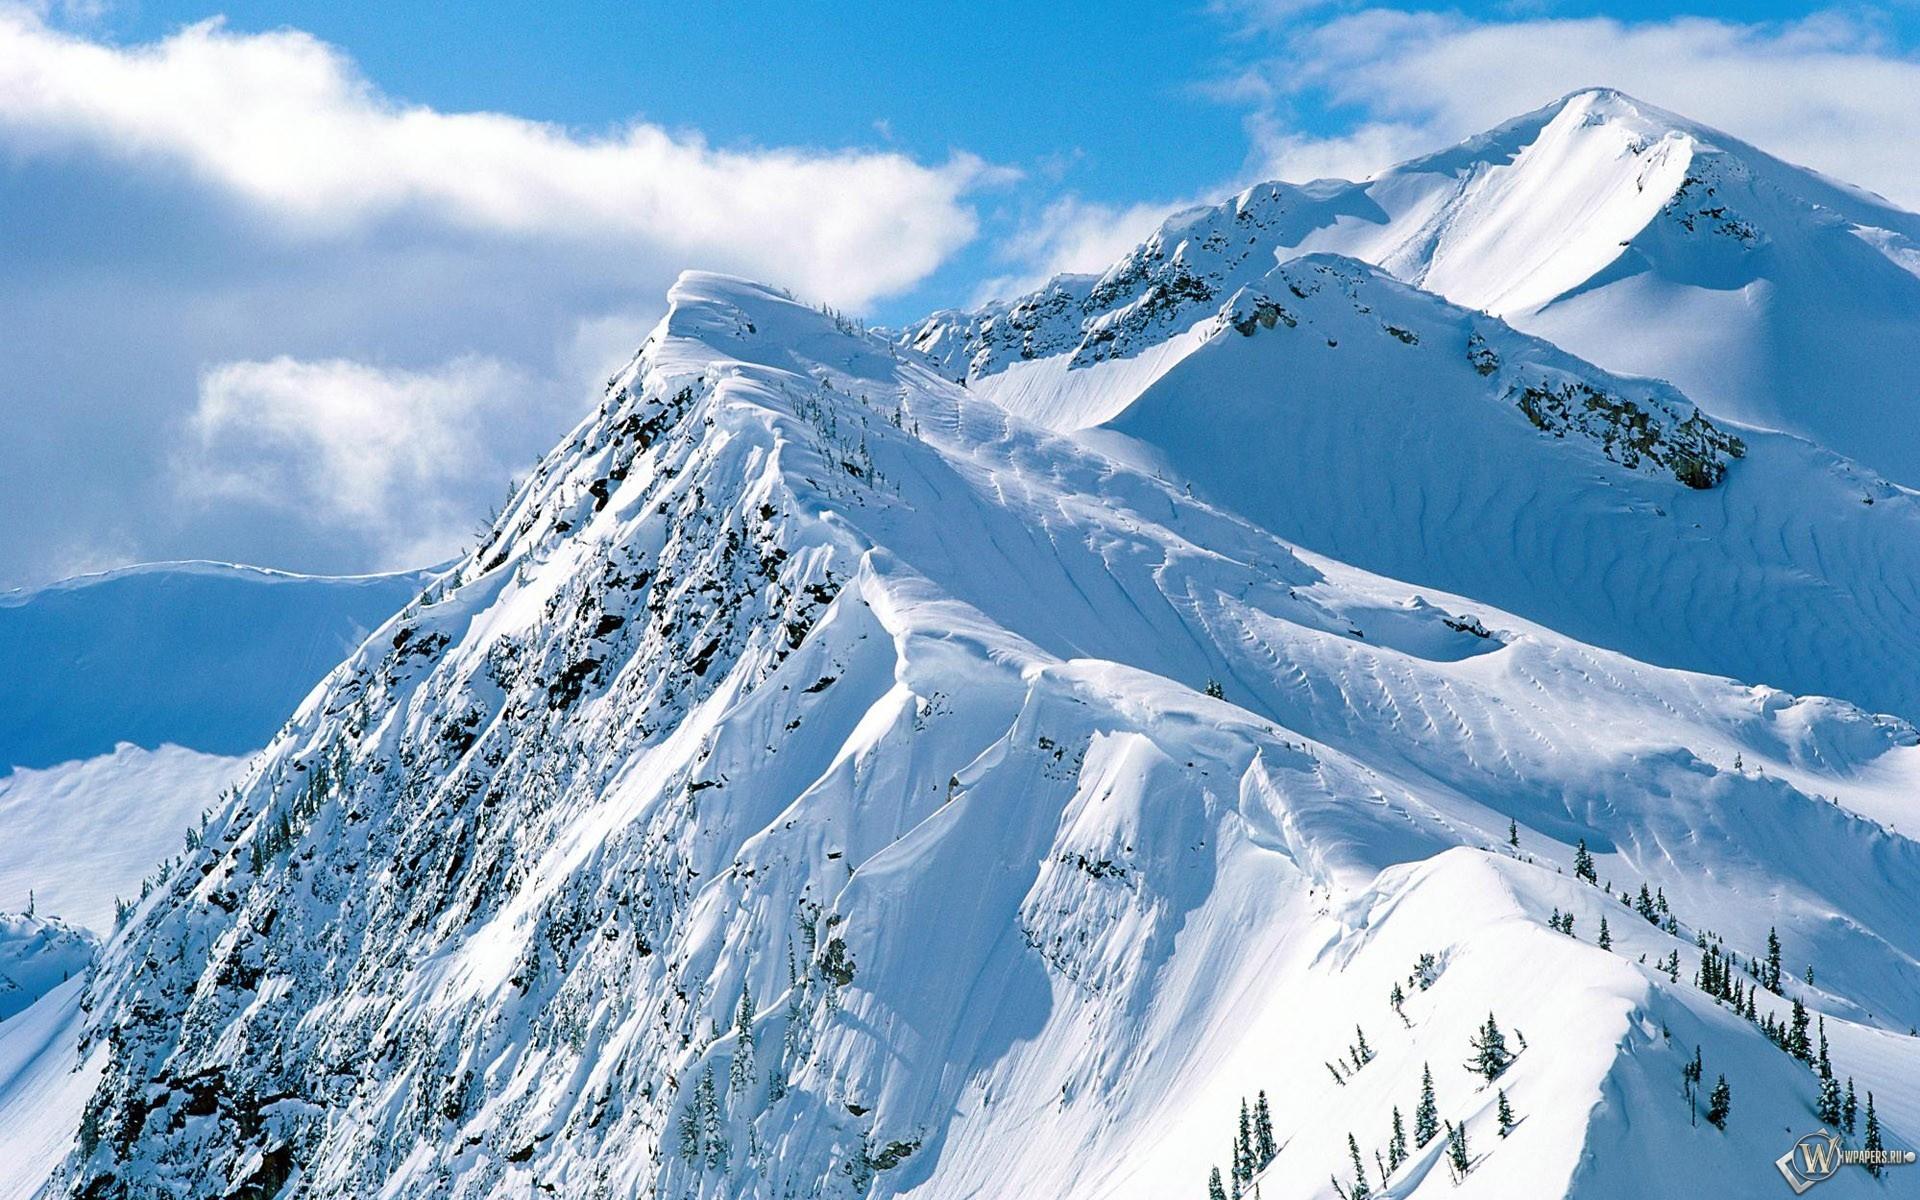 Снежные горы 1920x1200